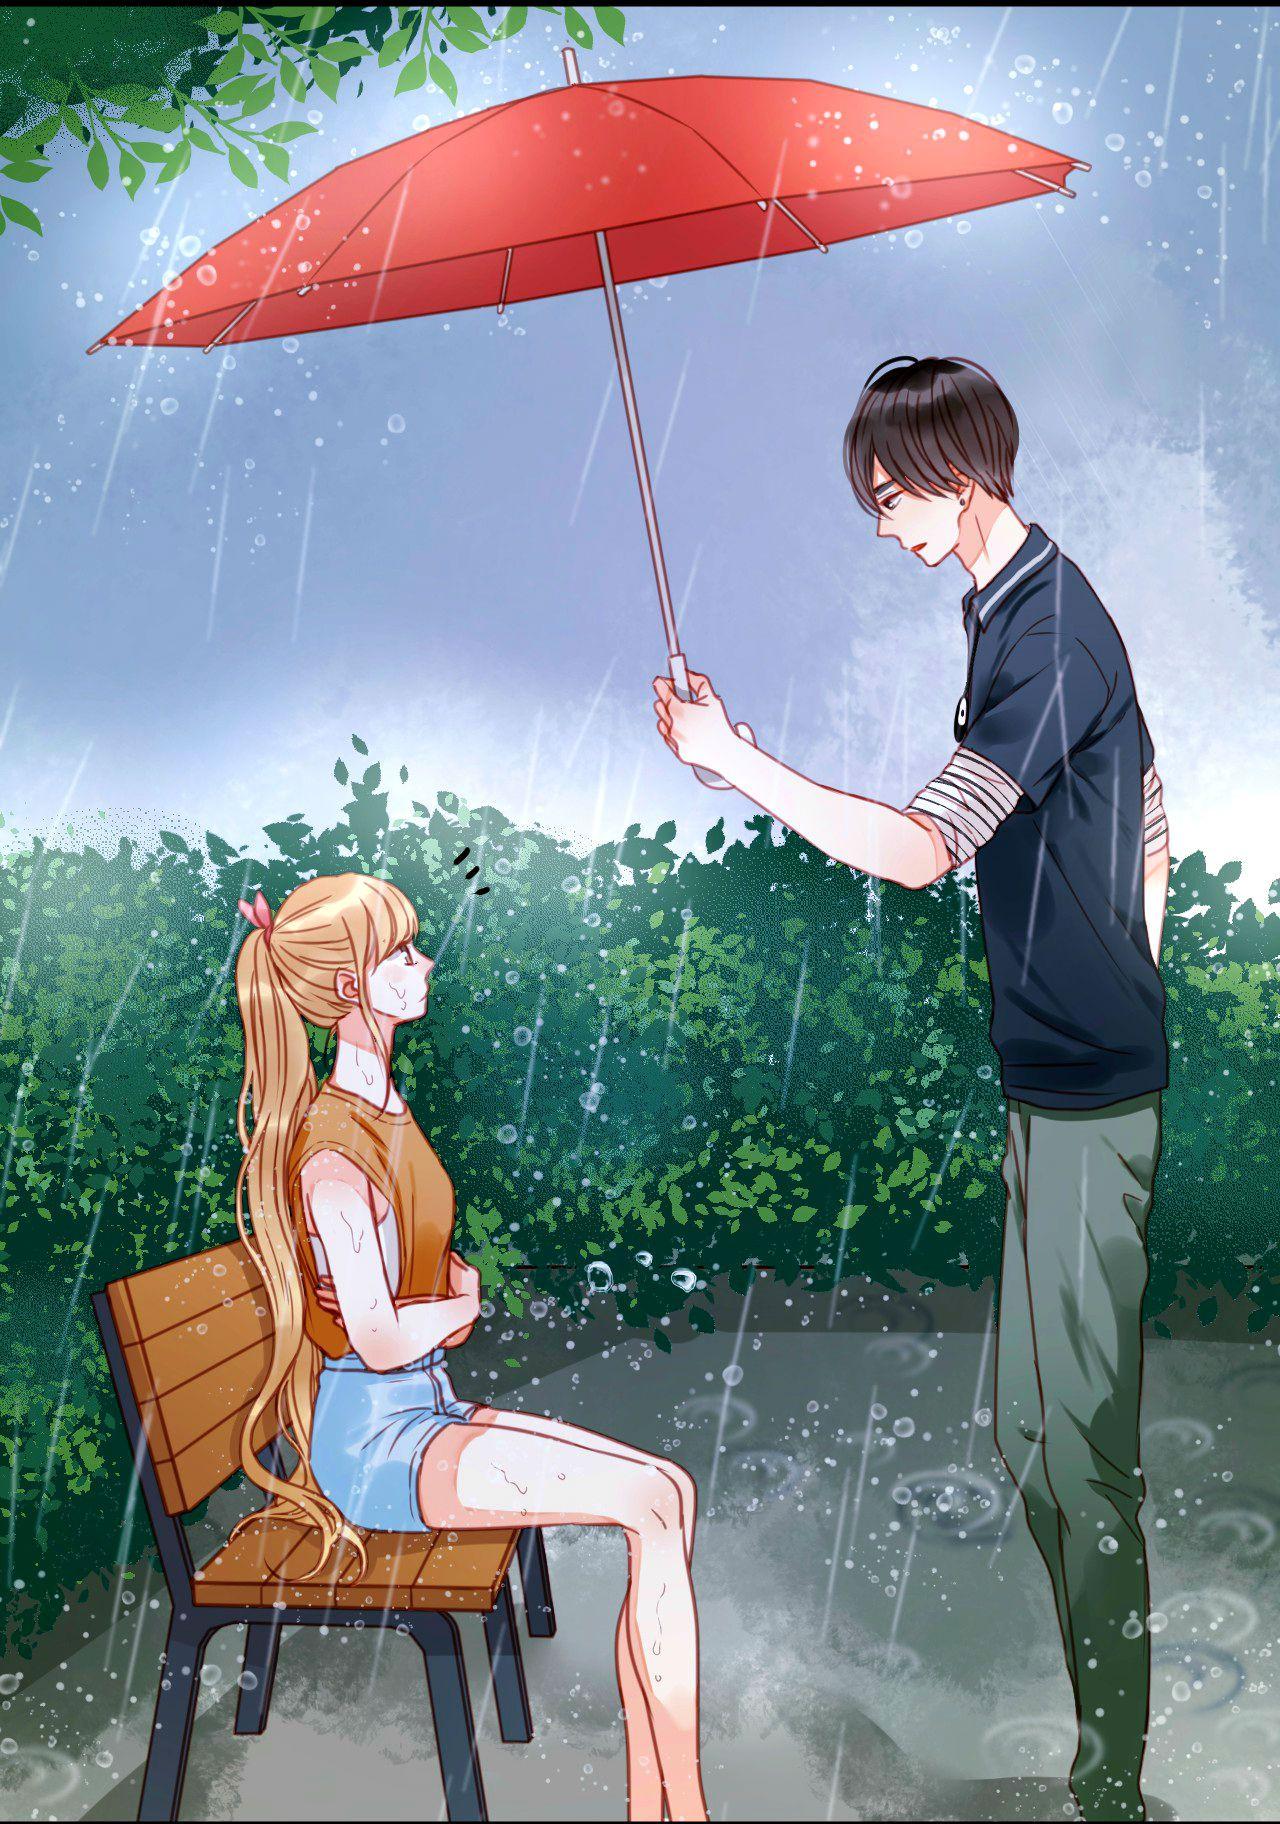 Rain Couple Cover Story Pasangan Animasi Animasi Dan Kartun